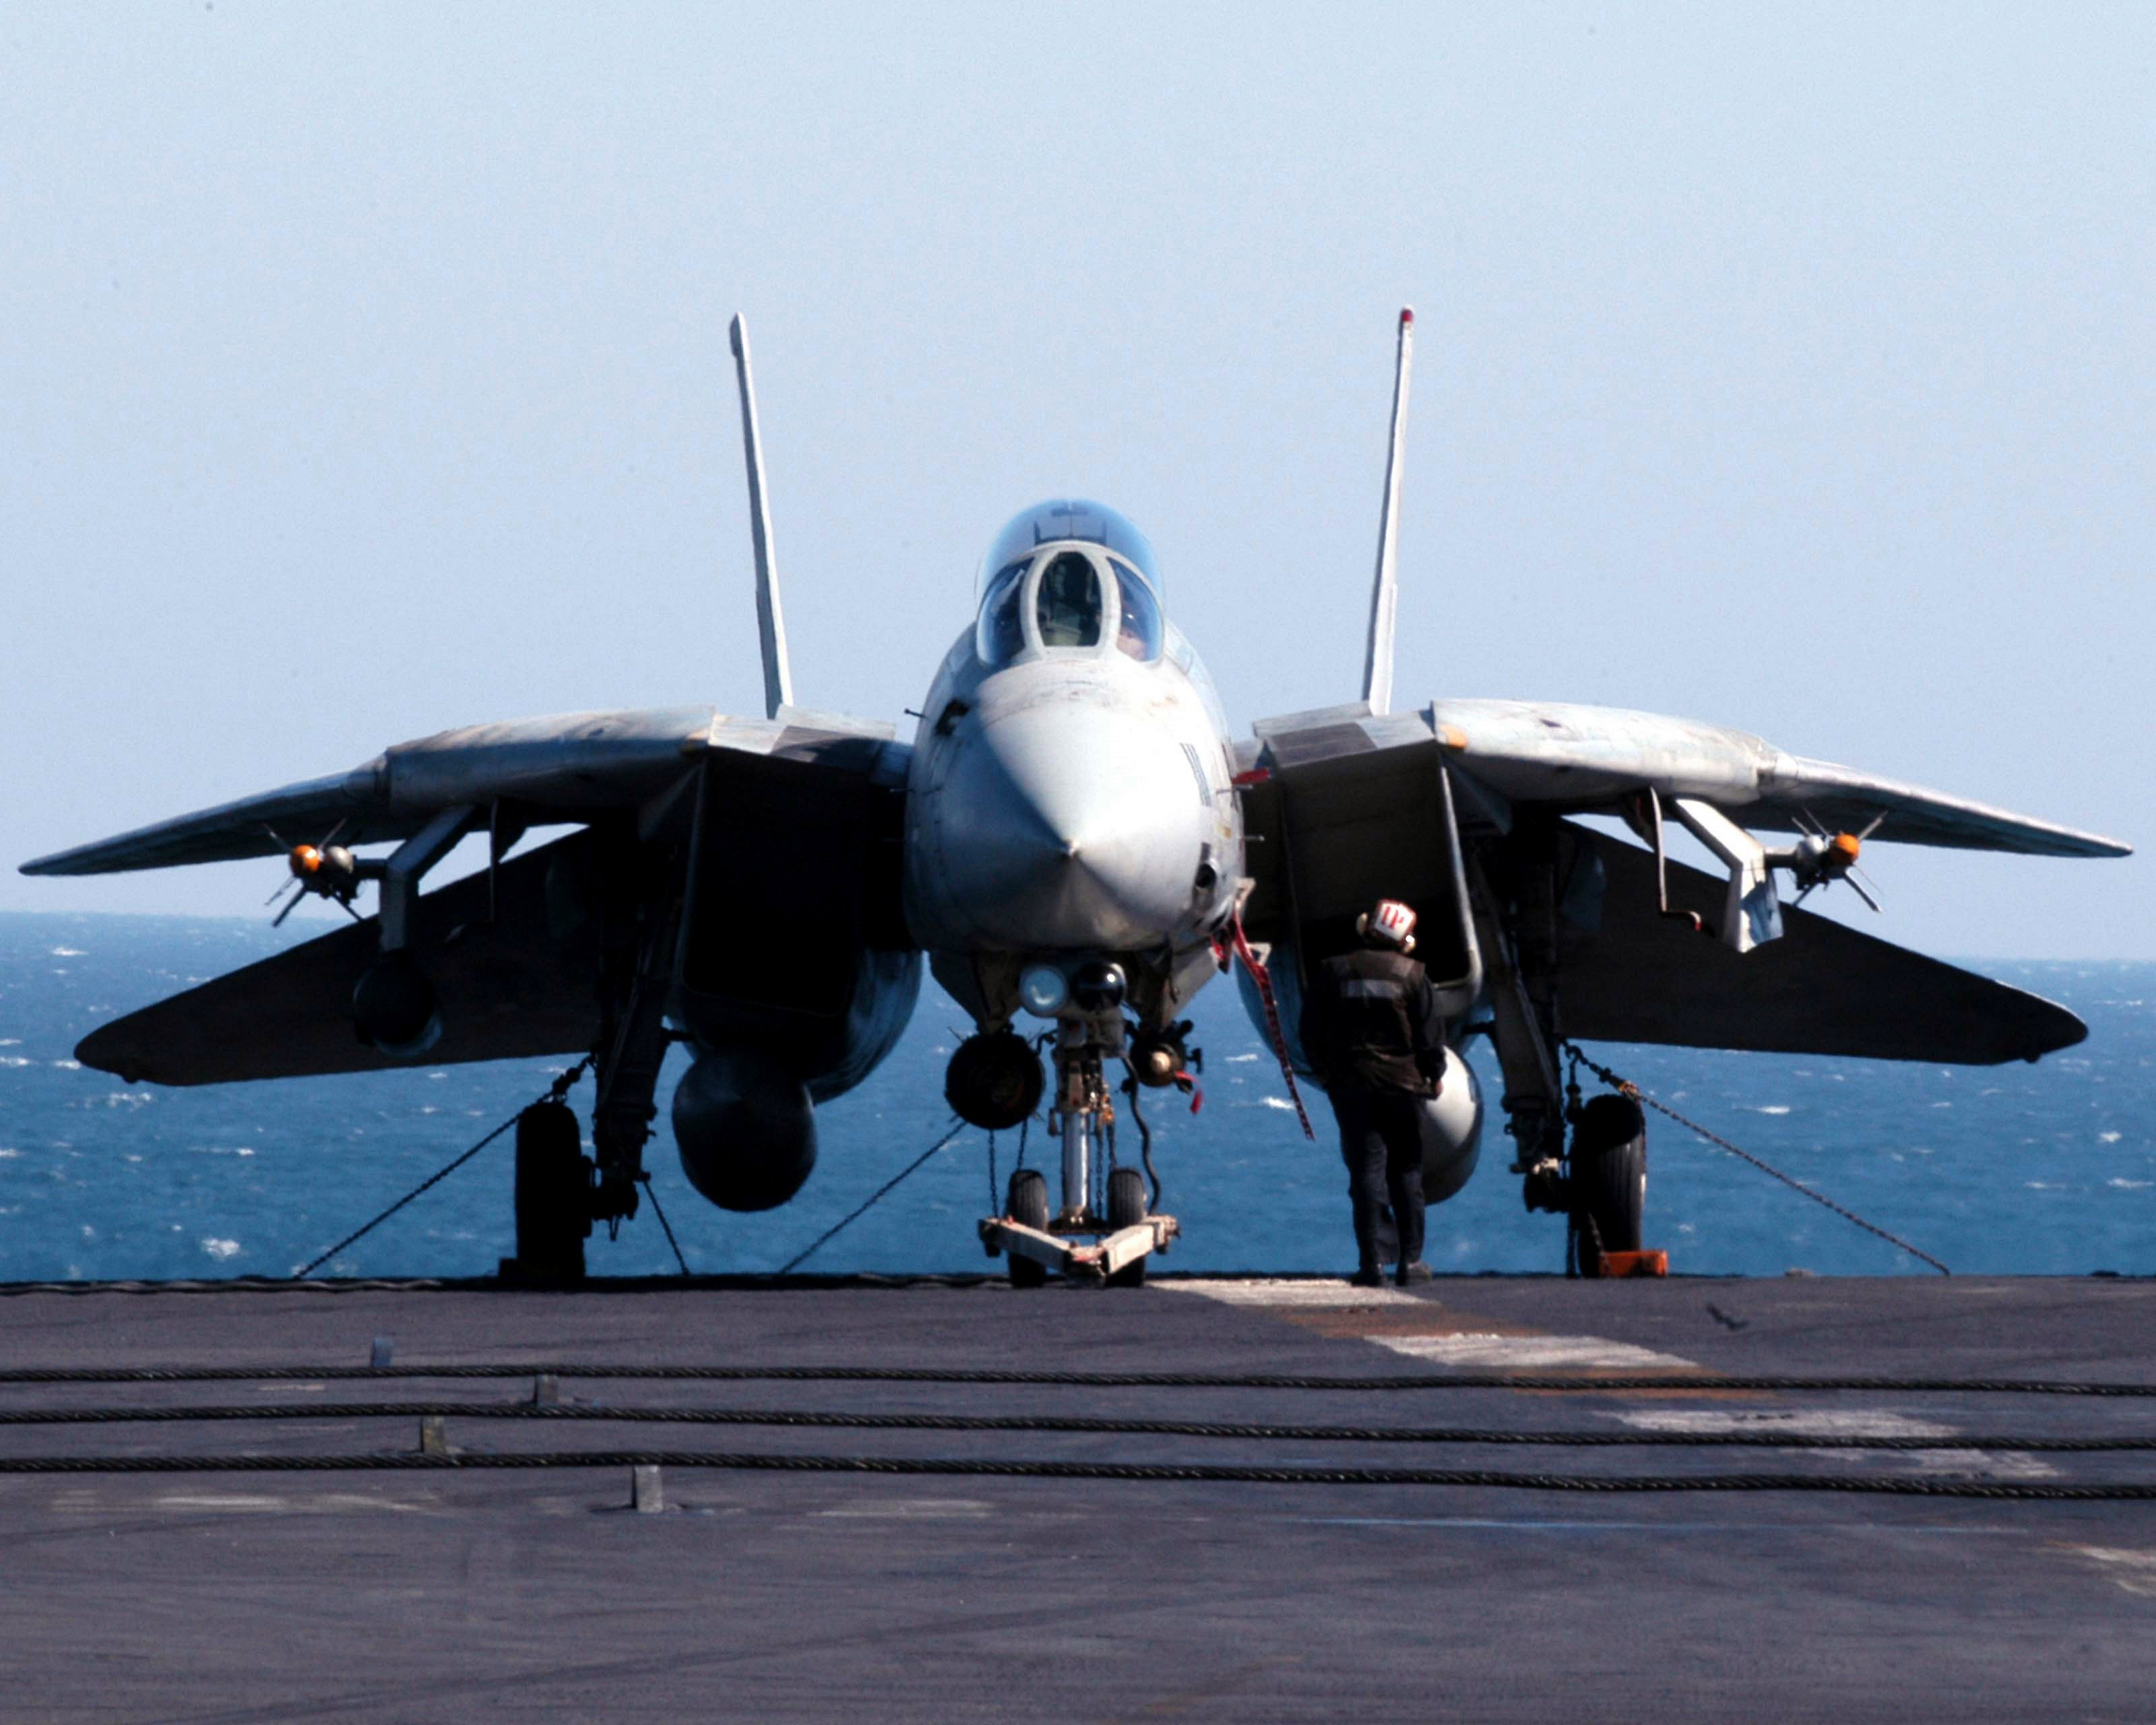 F 14 Super Tomcat F-14 Tomcat: The Navy ...